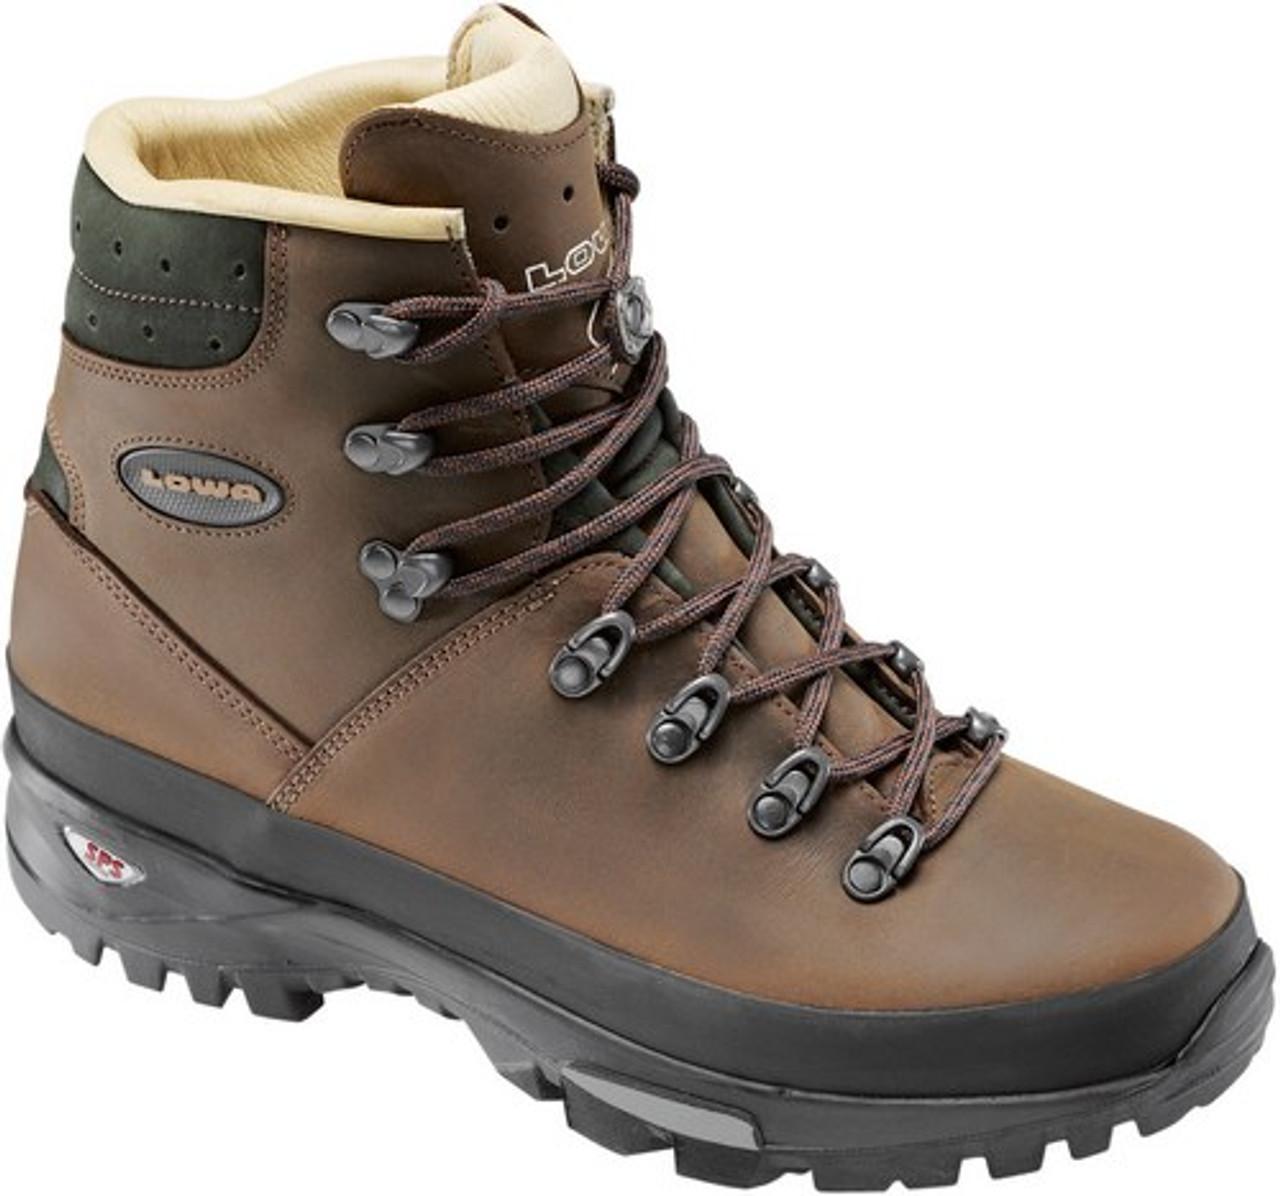 ba8237cfa5d Men's Lowa Terrano Hiking Boot